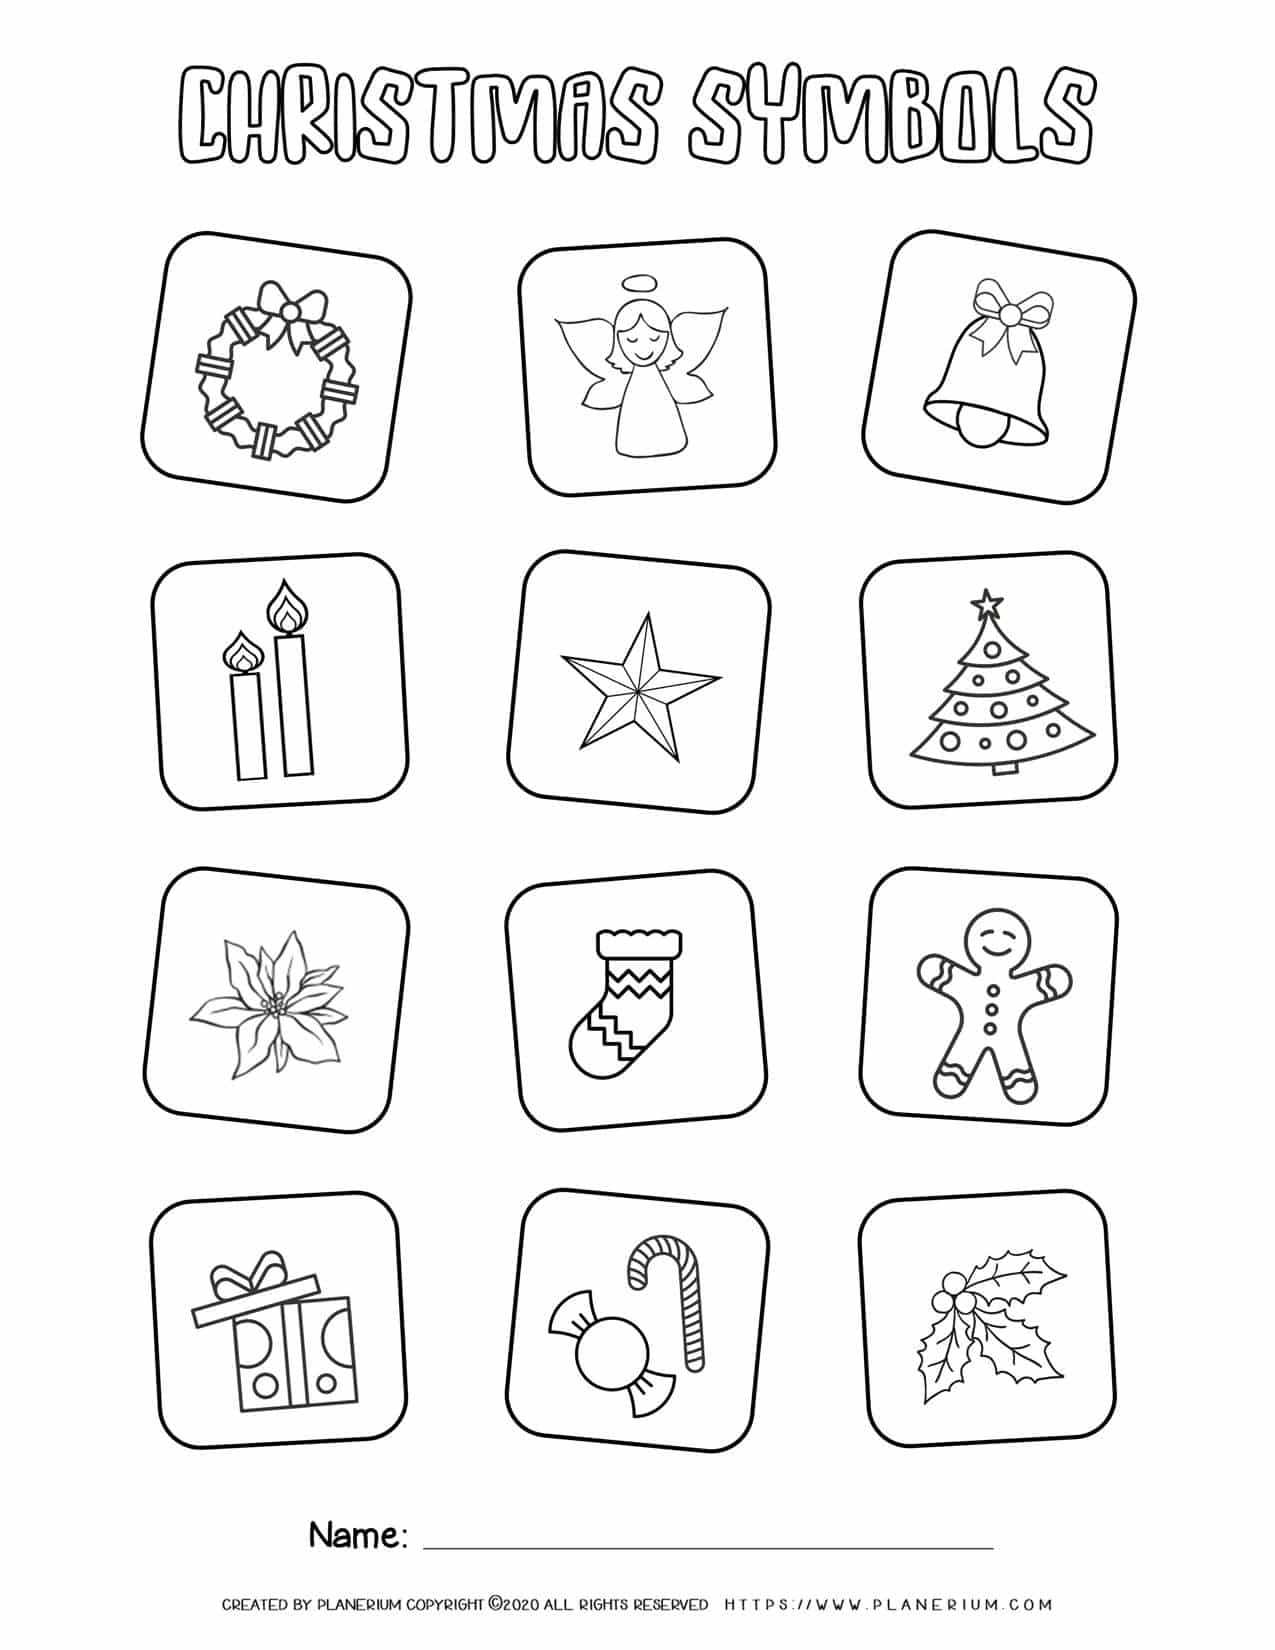 Christmas Symbols Coloring Page | Free Printables | Planerium